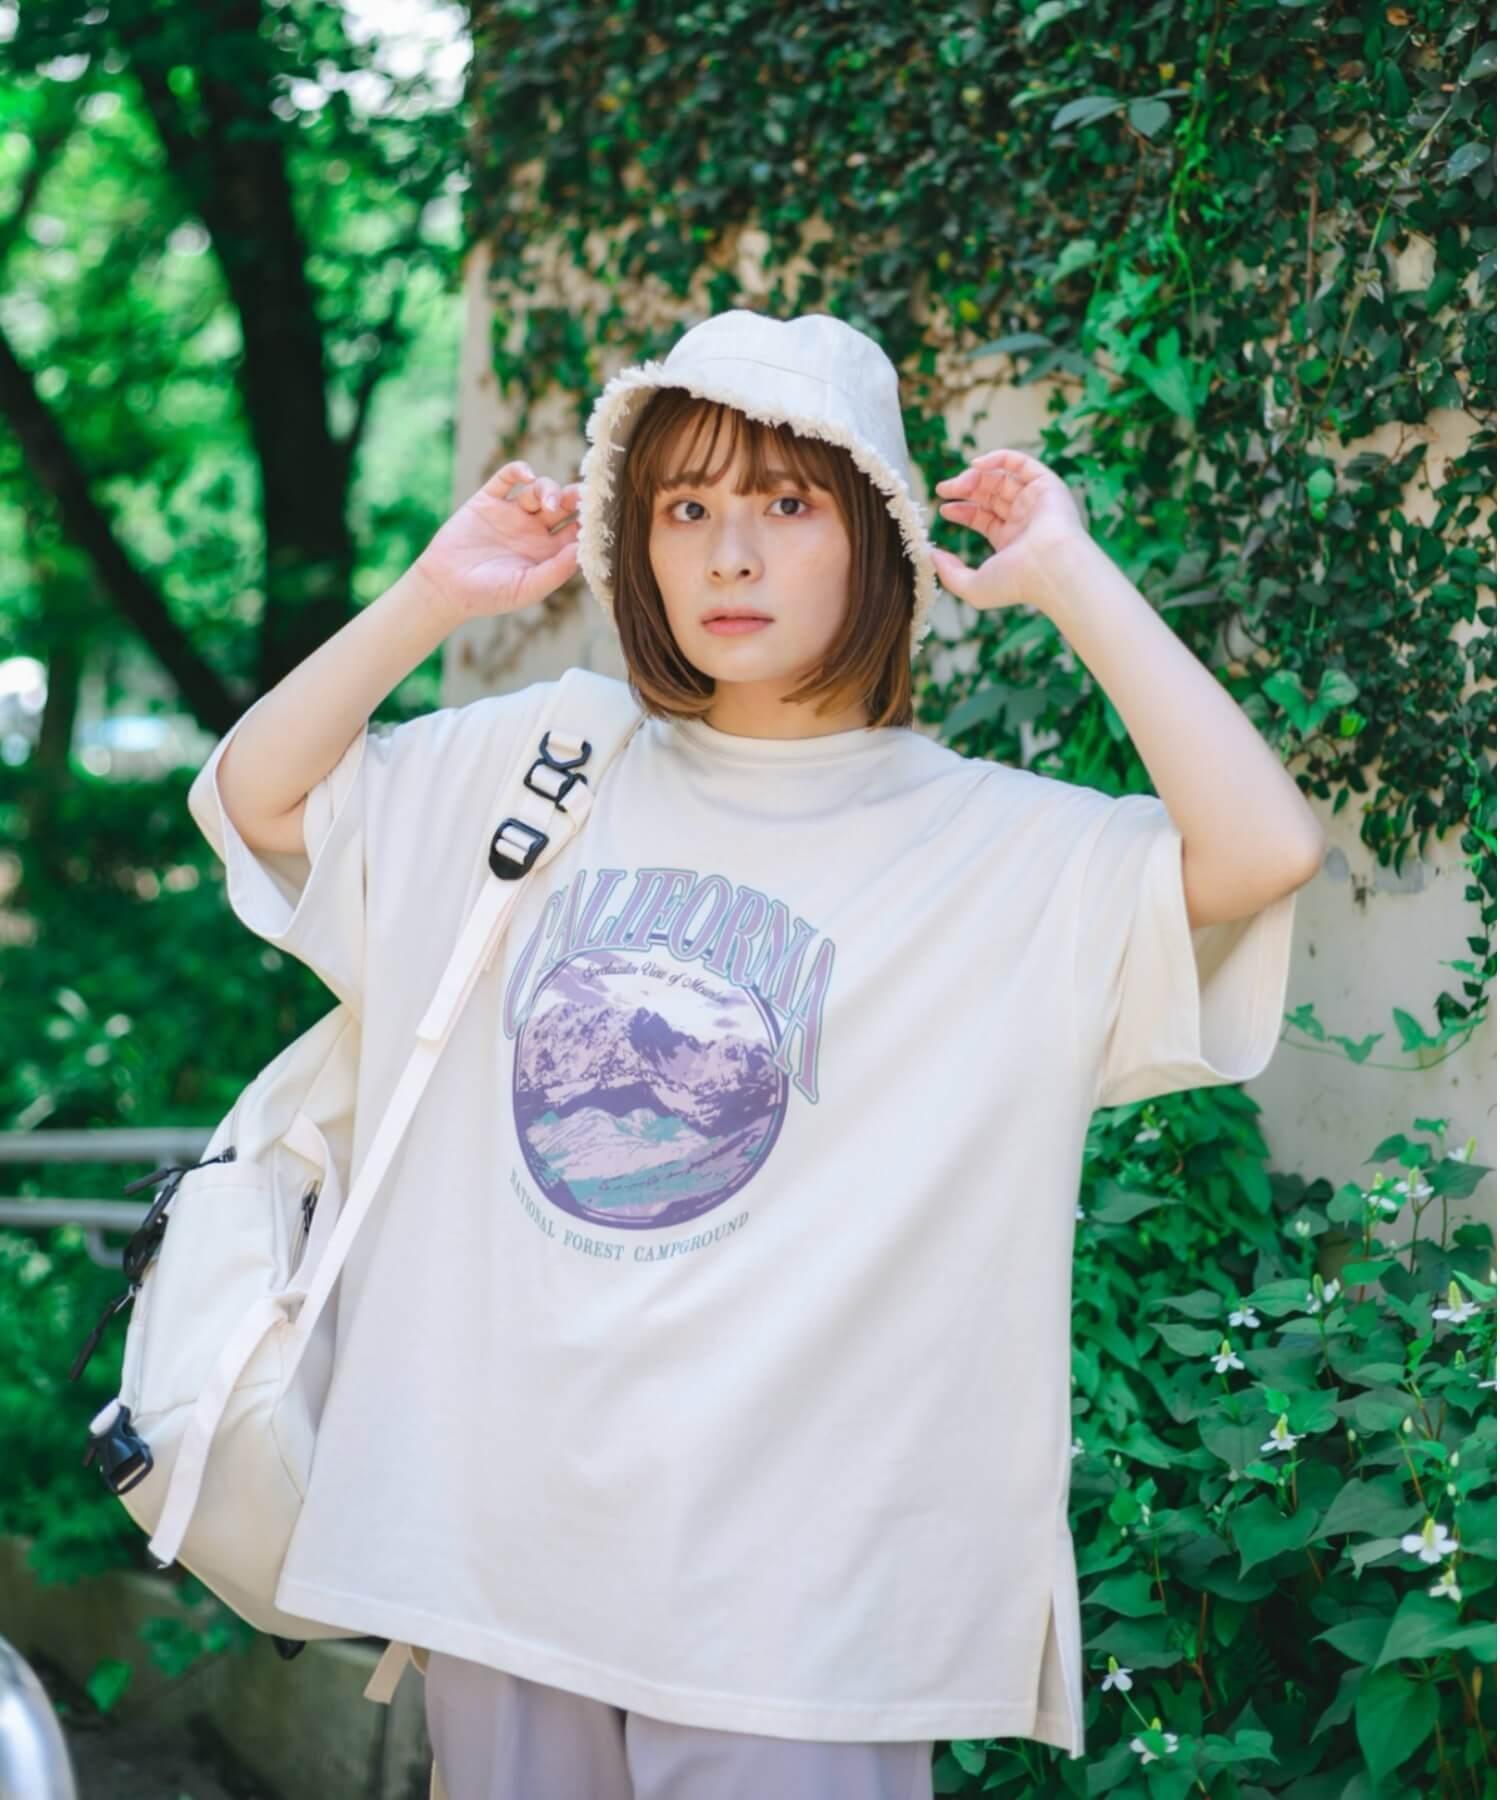 「nemne(ネンネ)」のアソートプリントT/¥1,695(税込み)